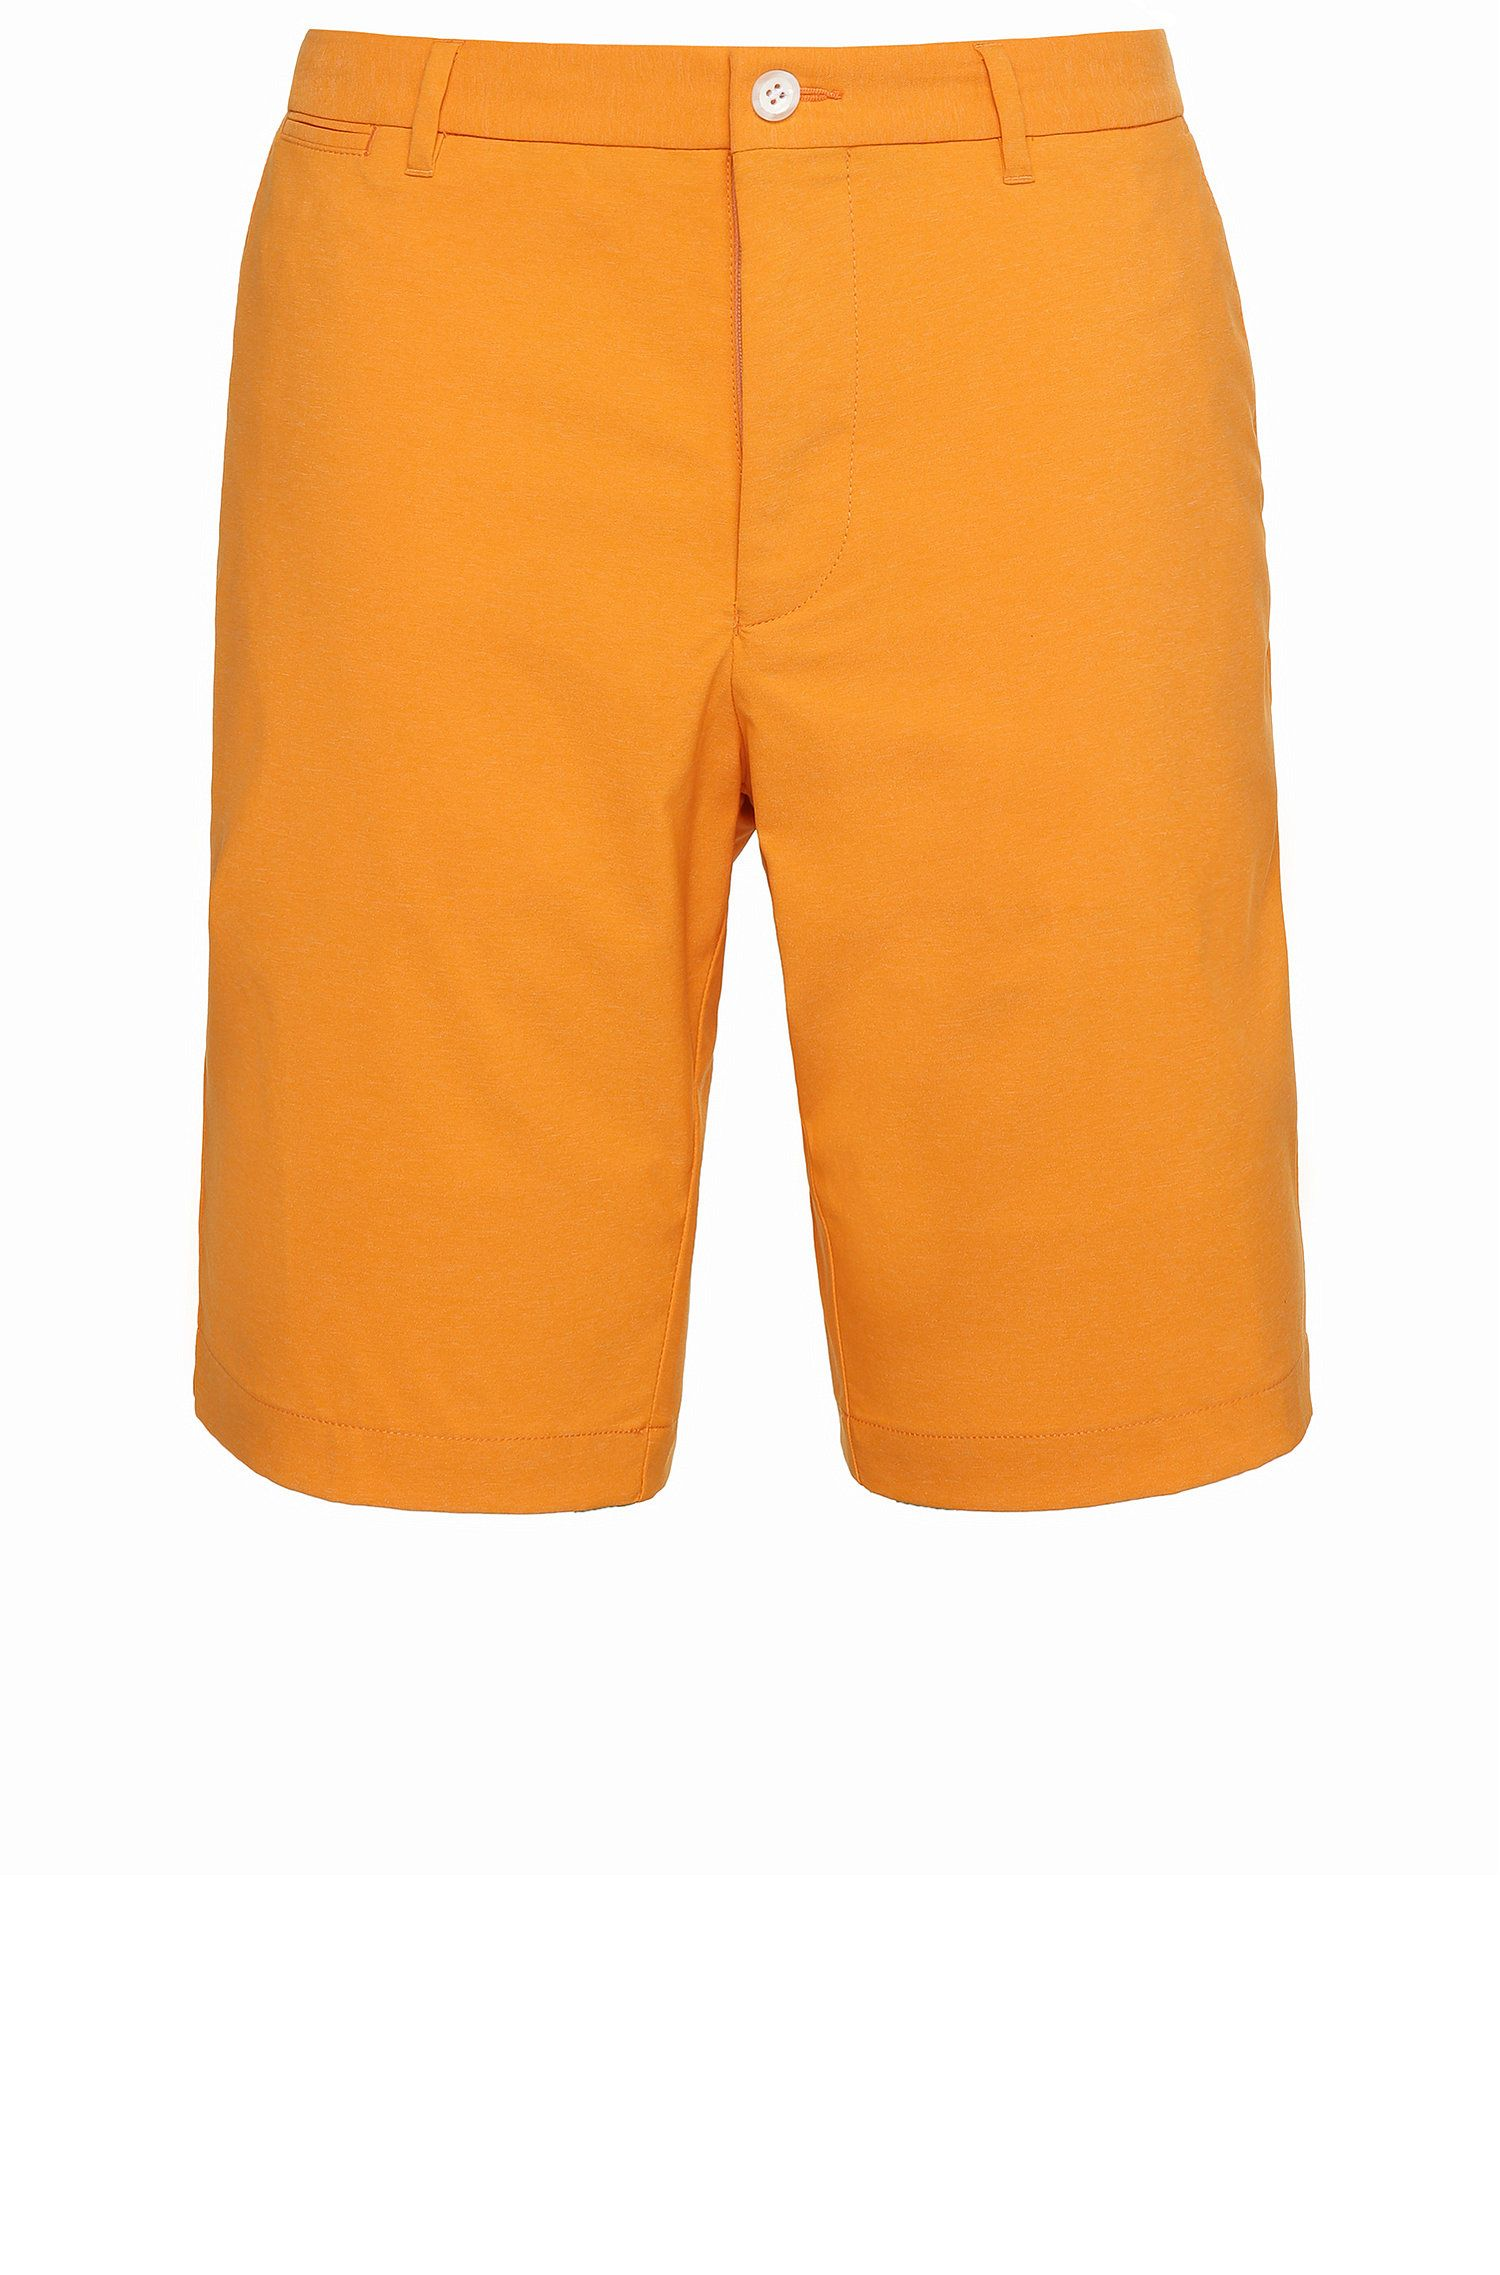 'Hayler Slim' | Slim Fit, Coolmax High Performance Golf Shorts